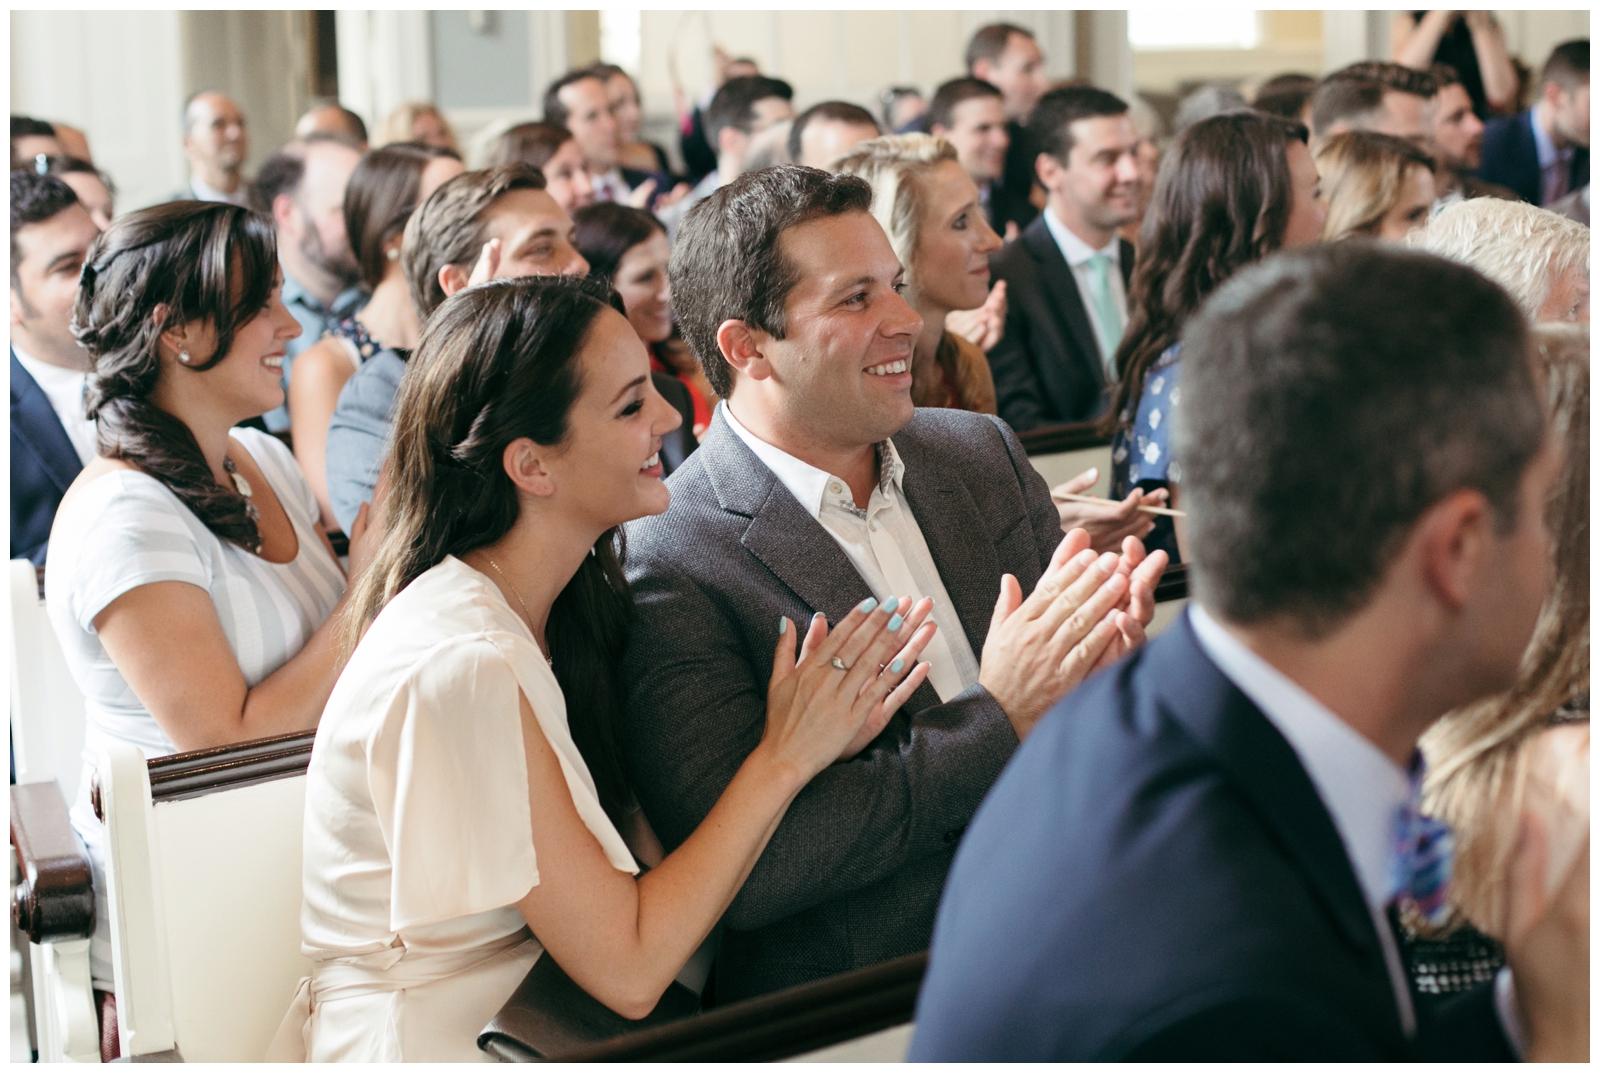 Bailey-Q-Photo-Backyard-Wedding-South-Shore-Boston-Wedding-Photographer-053.jpg